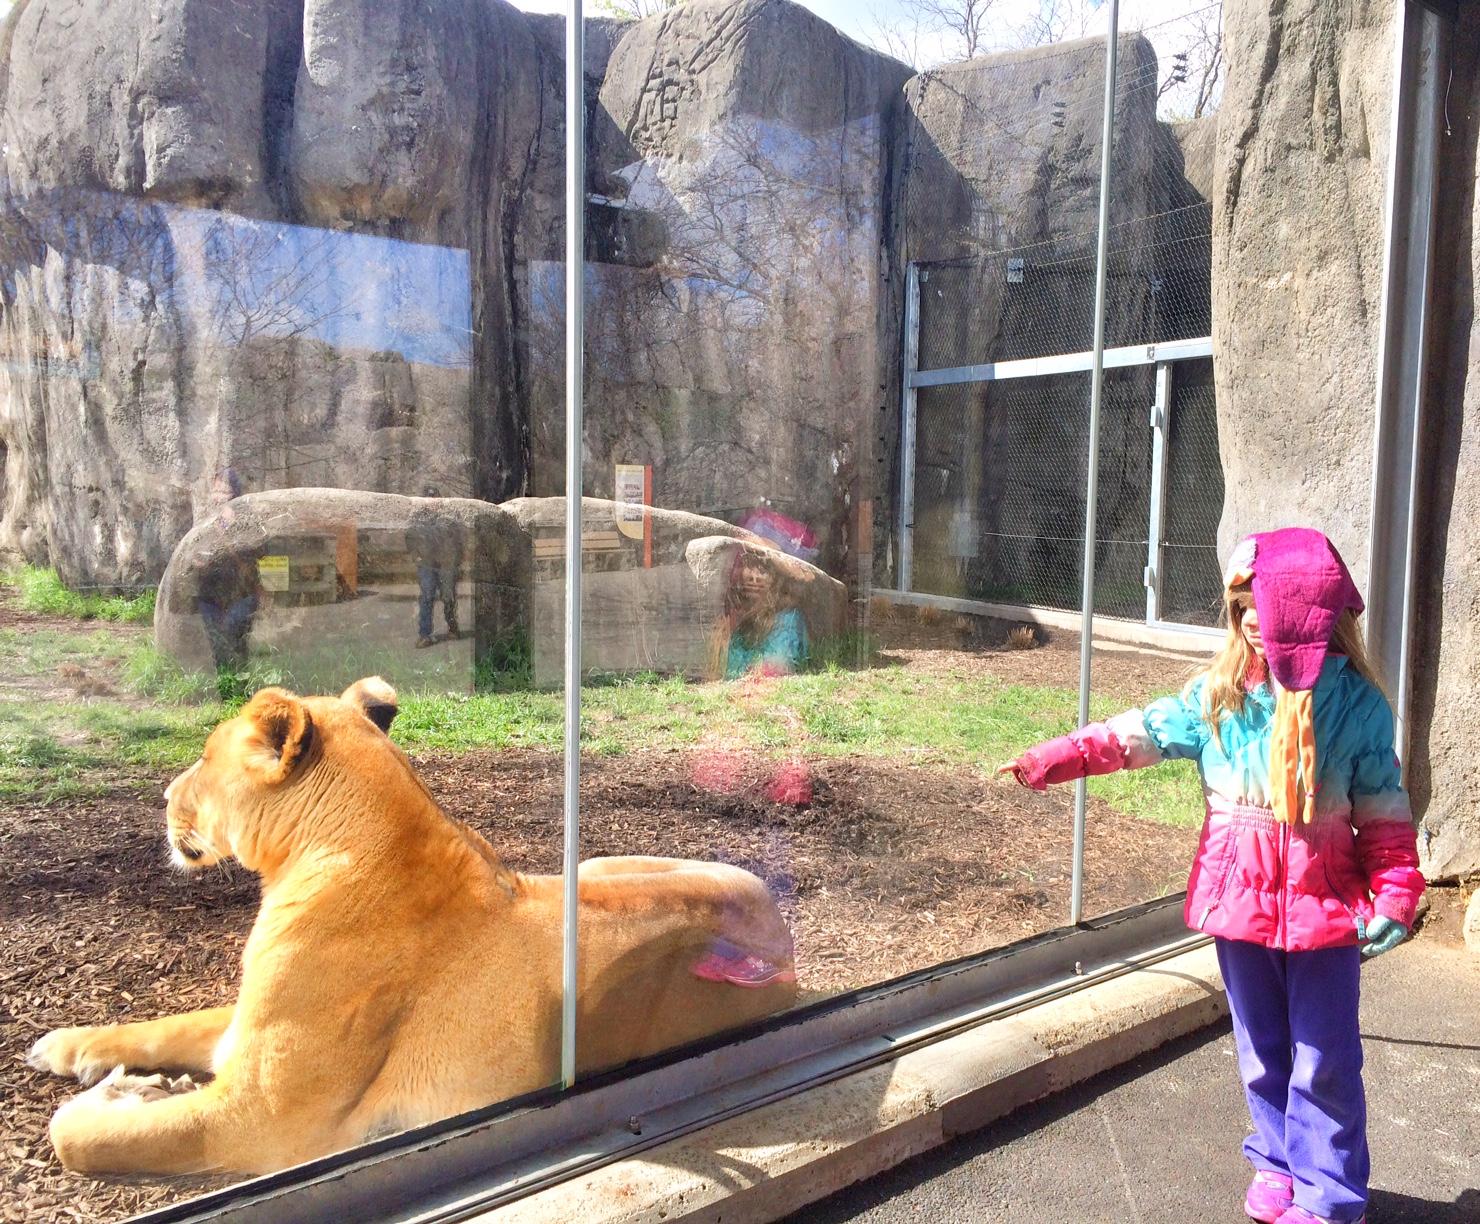 kid fun in indianapolis - Indianapolis Zoo